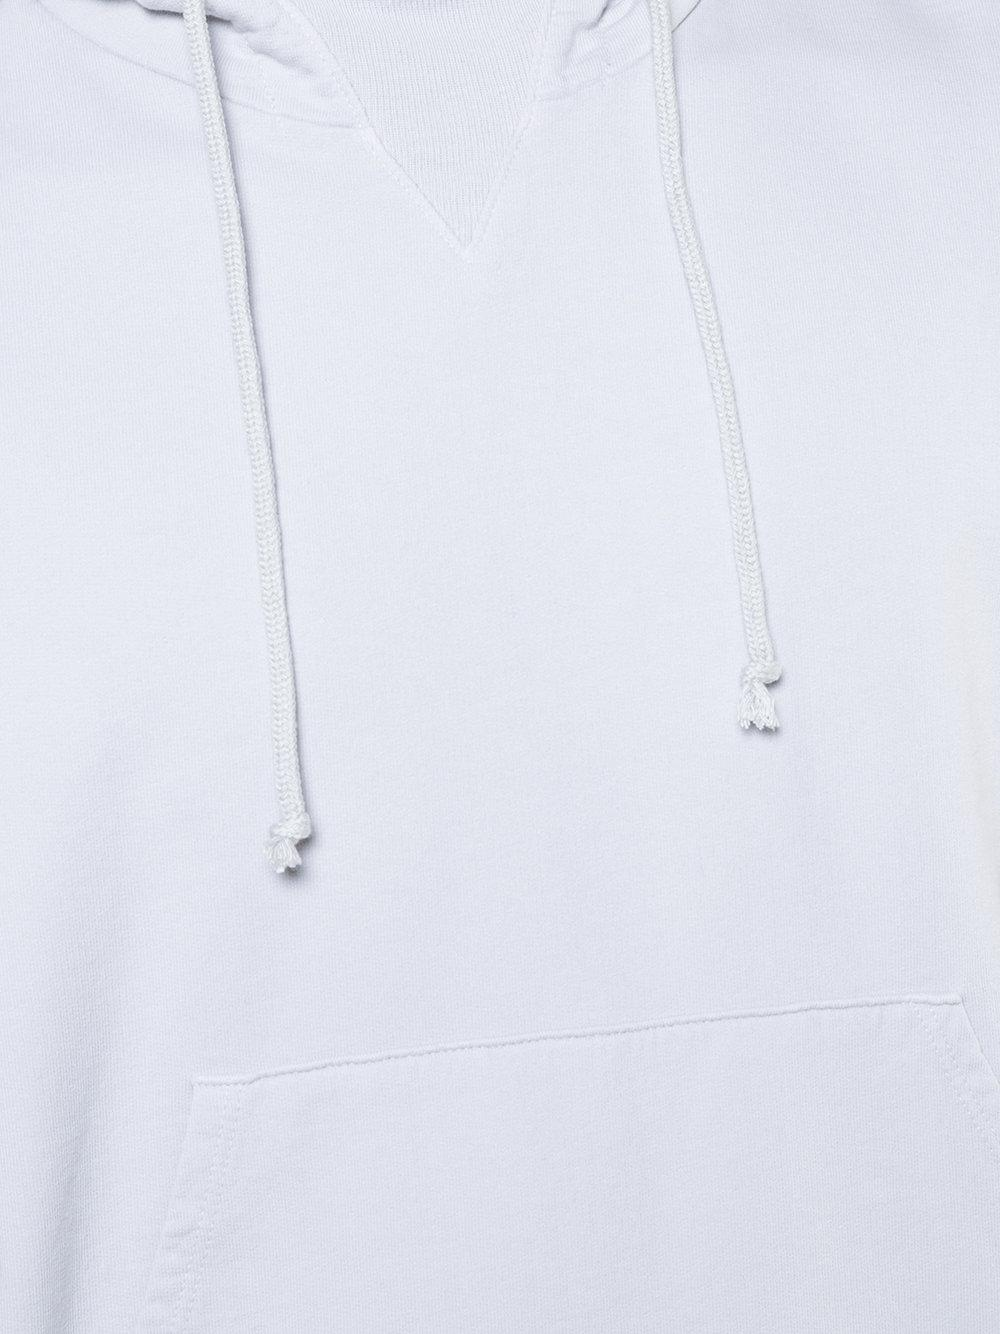 John Elliott Cotton Kake Mock Pullover Hoodie in Grey (Grey) for Men